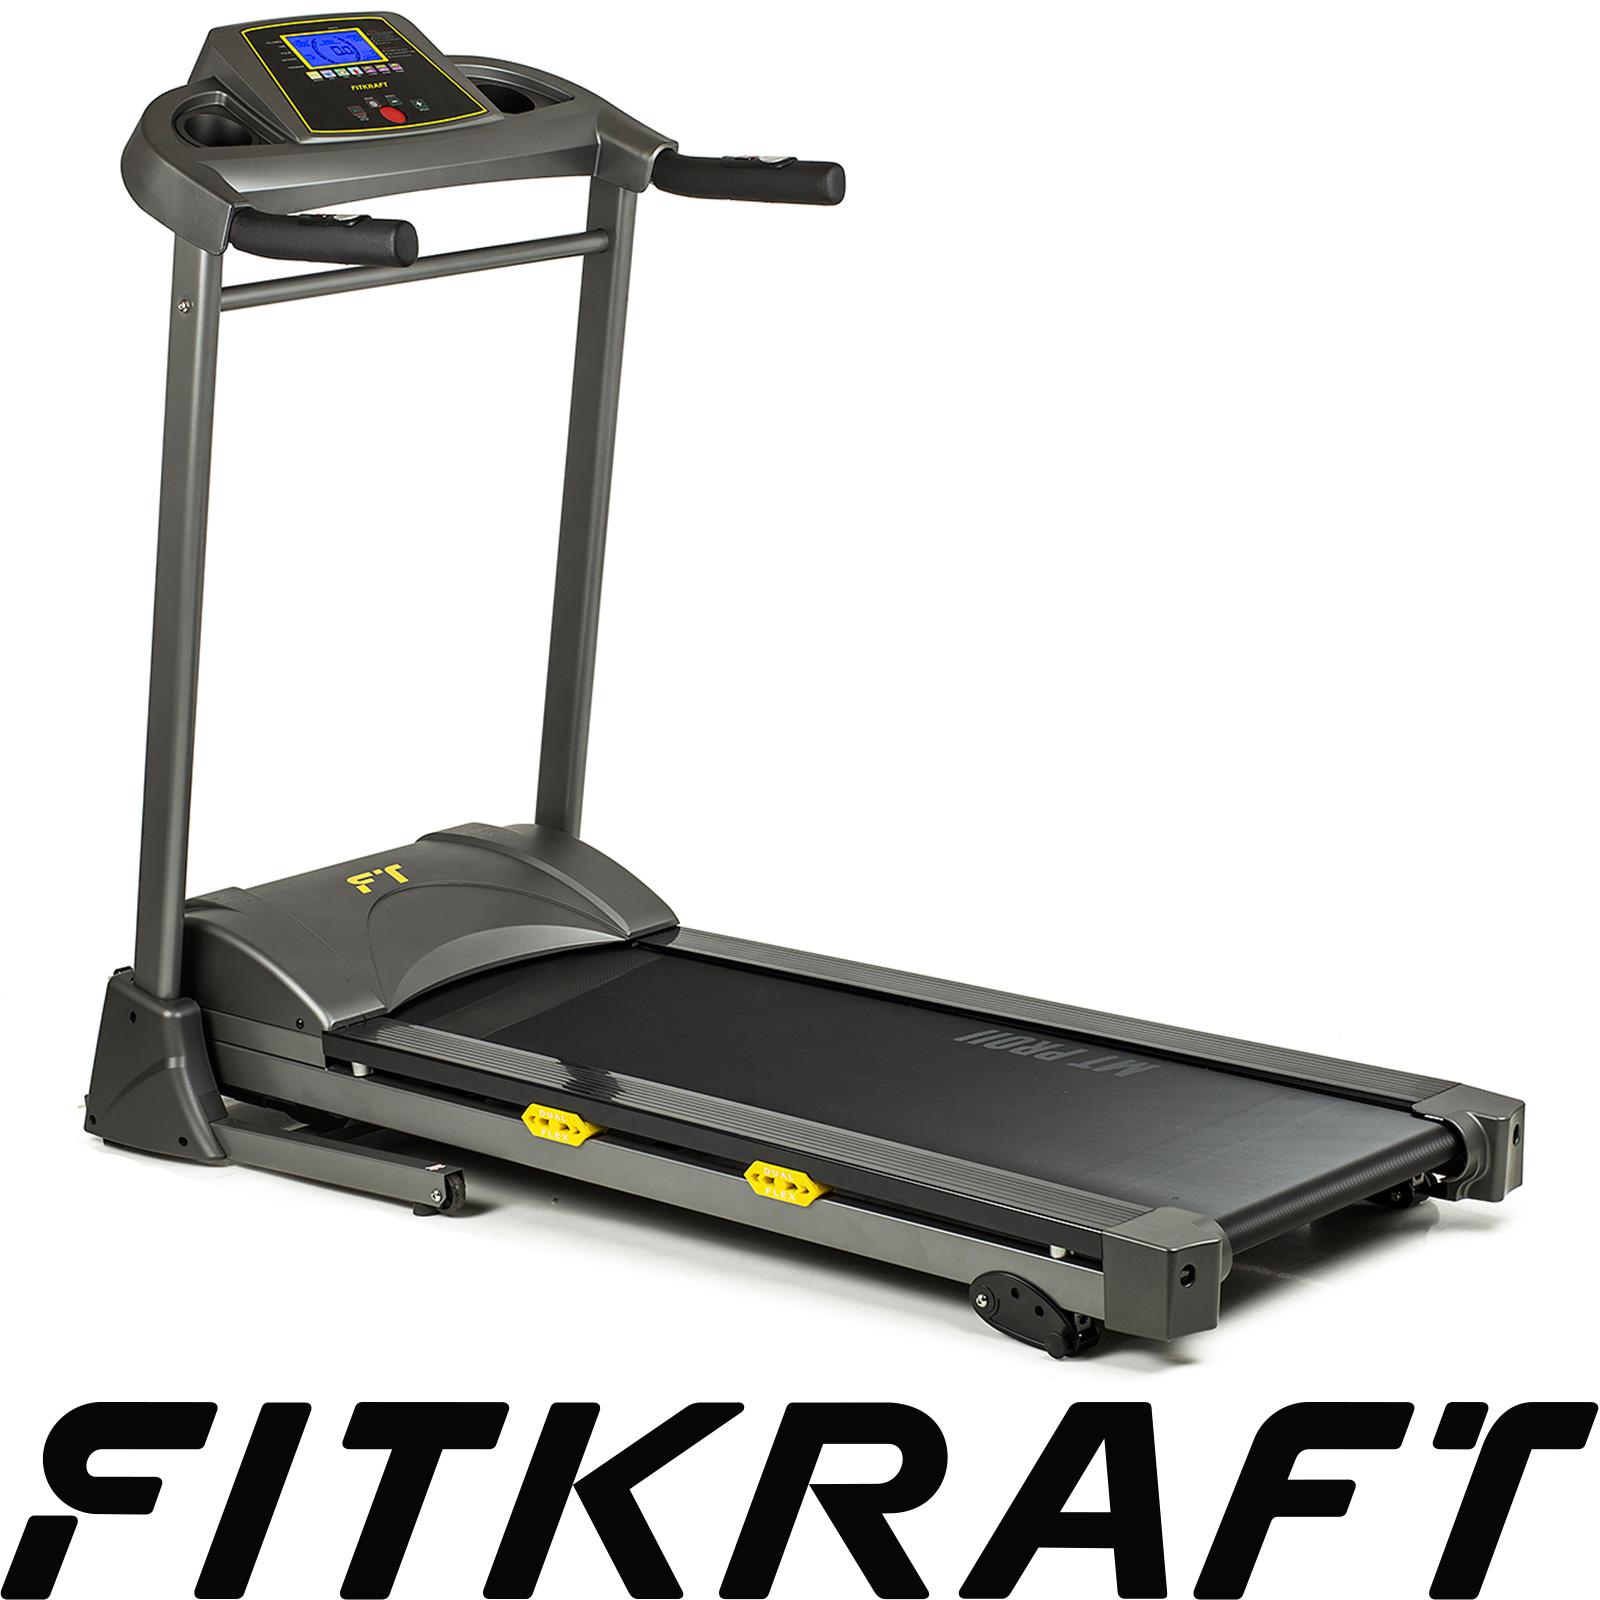 Bieżnia elektryczna MT-PRO FITKRAFT 16km/h 120kg